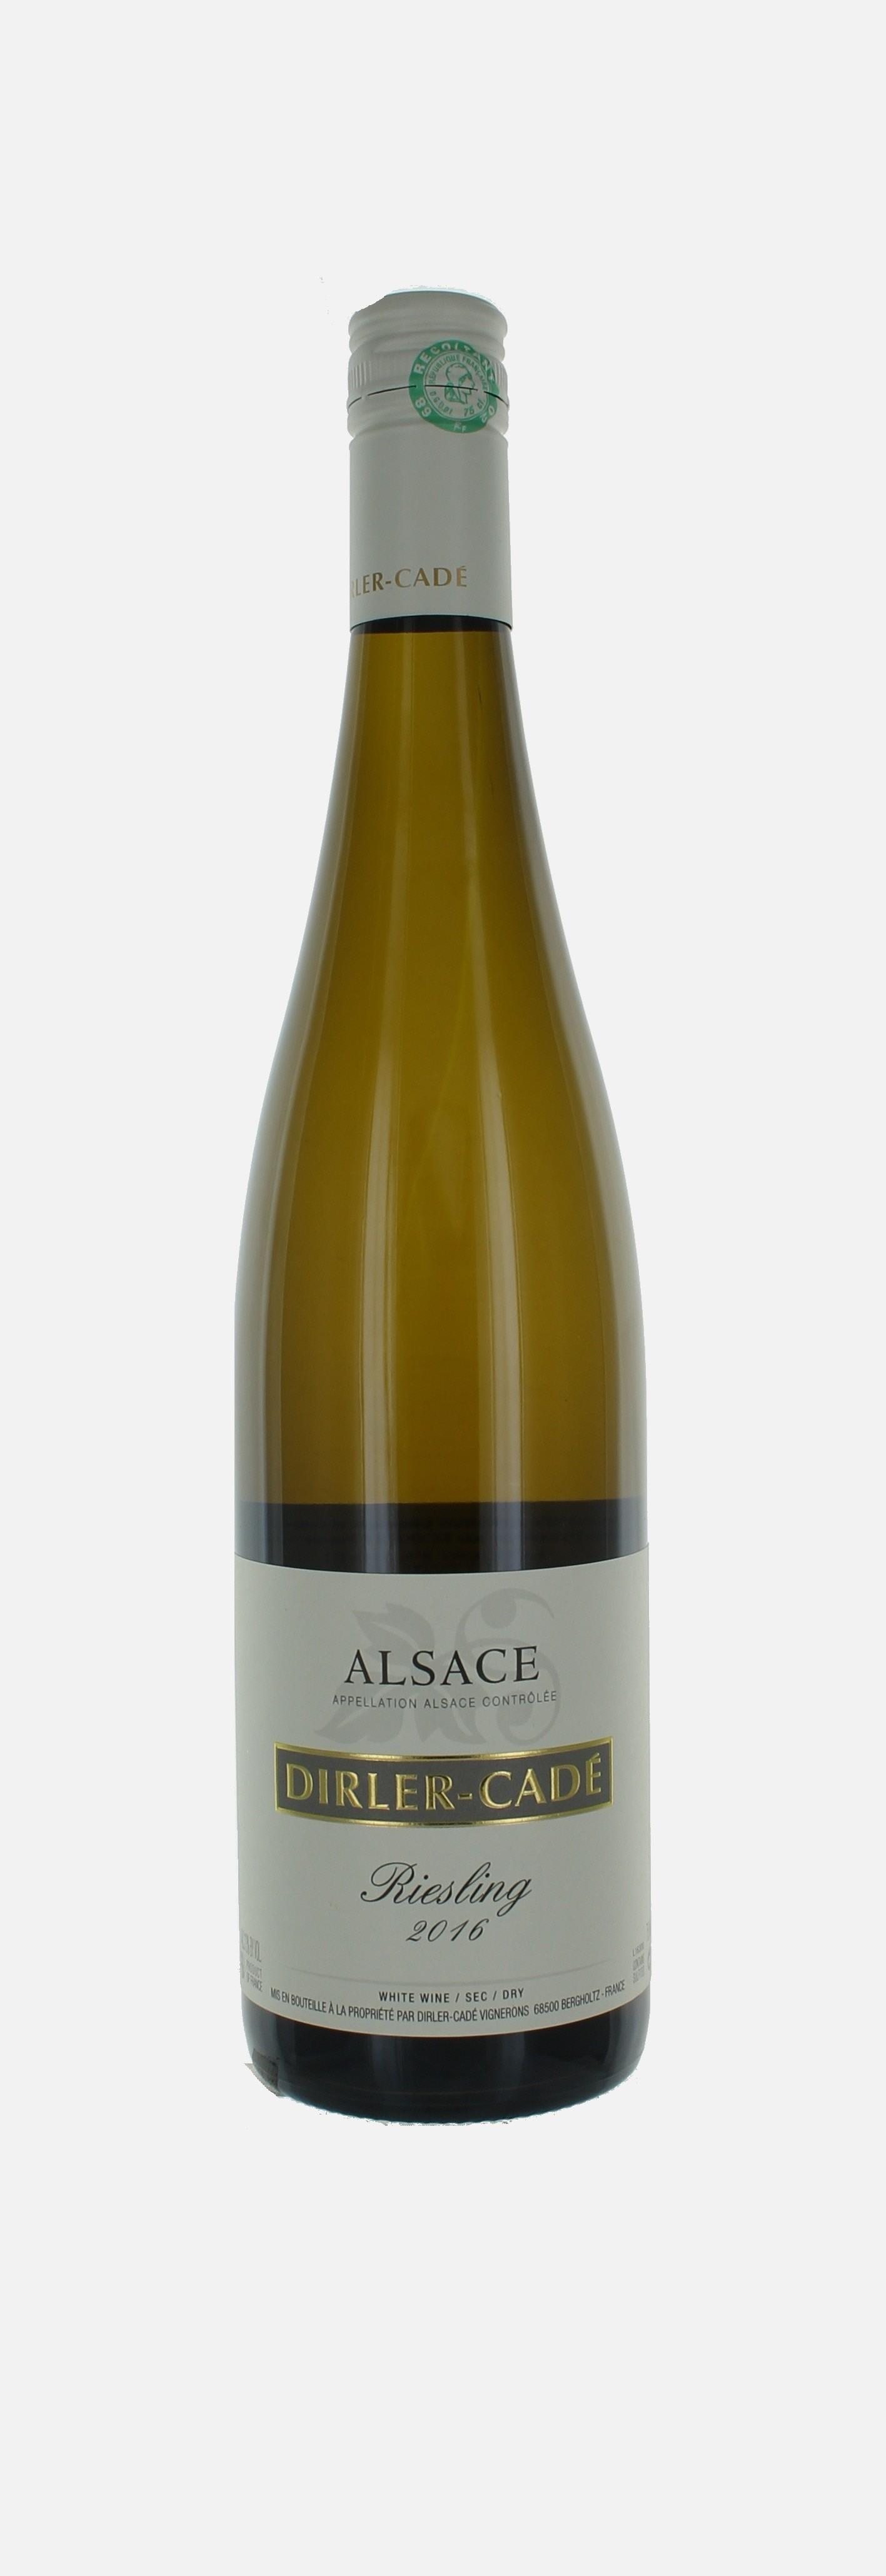 Riesling, Alsace, Domaine Direler-Cade